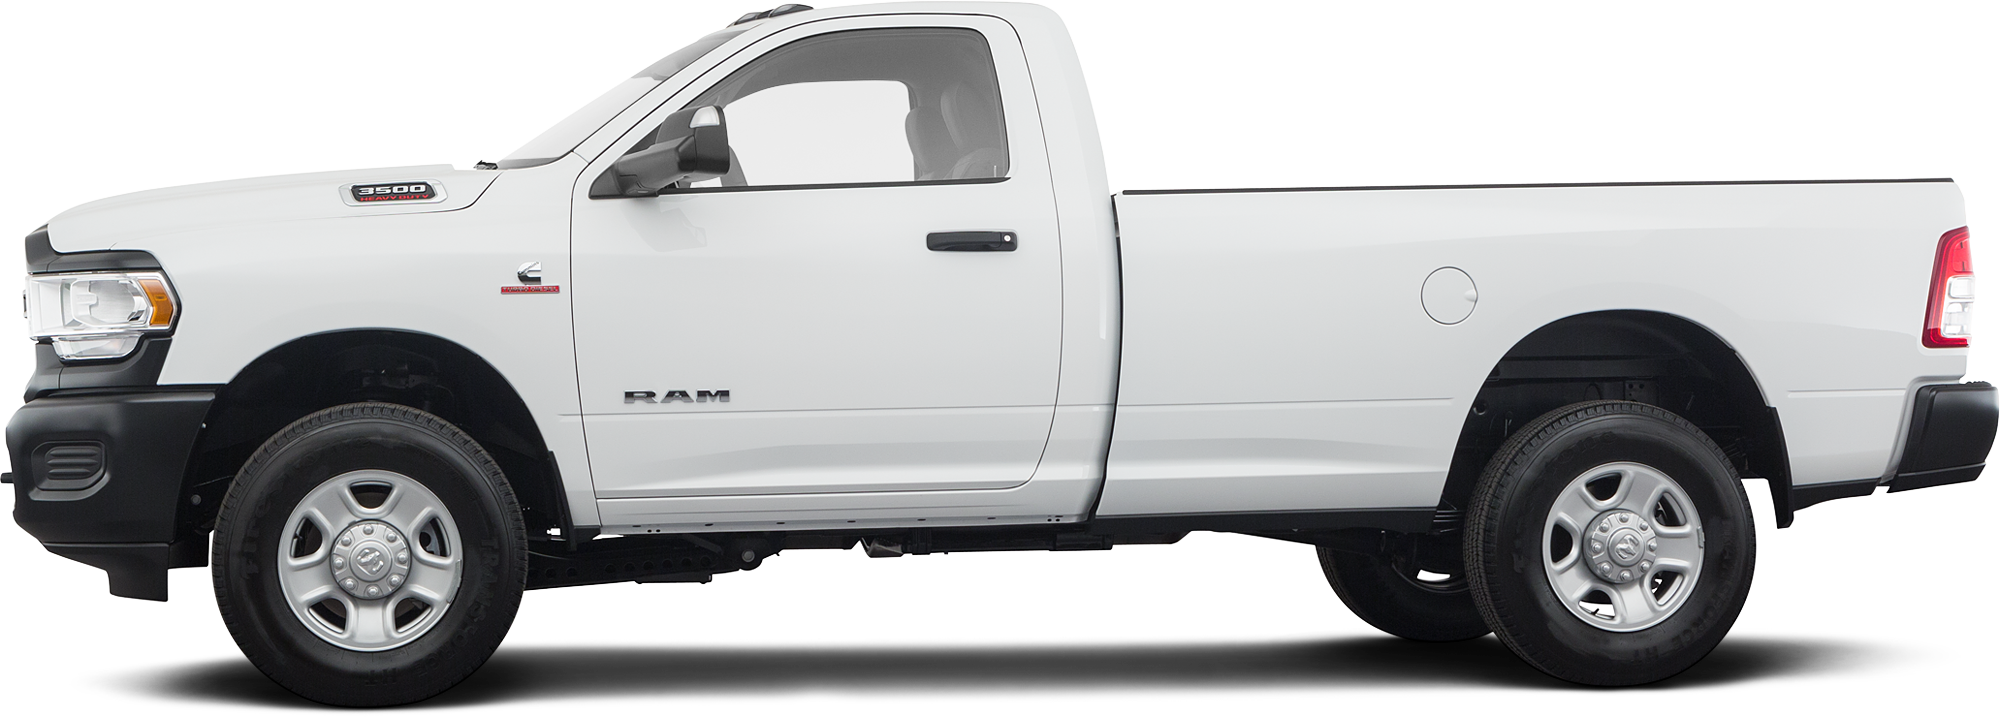 2022 Ram 3500 Truck Tradesman